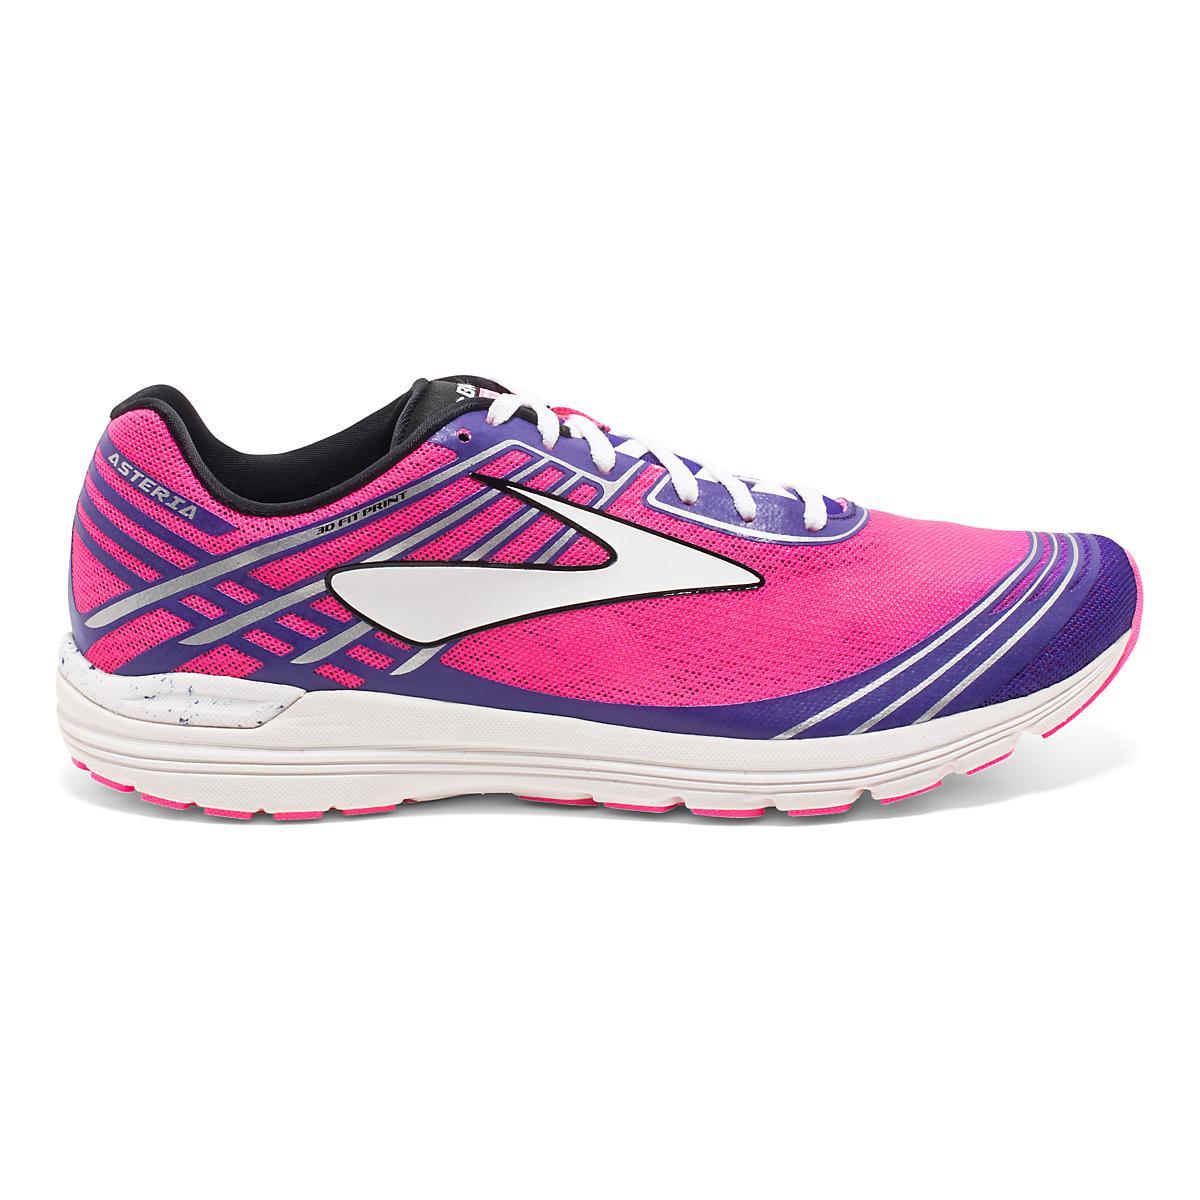 bcb78eb6bb066 Womens Brooks Asteria Racing Shoe at Road Runner Sports